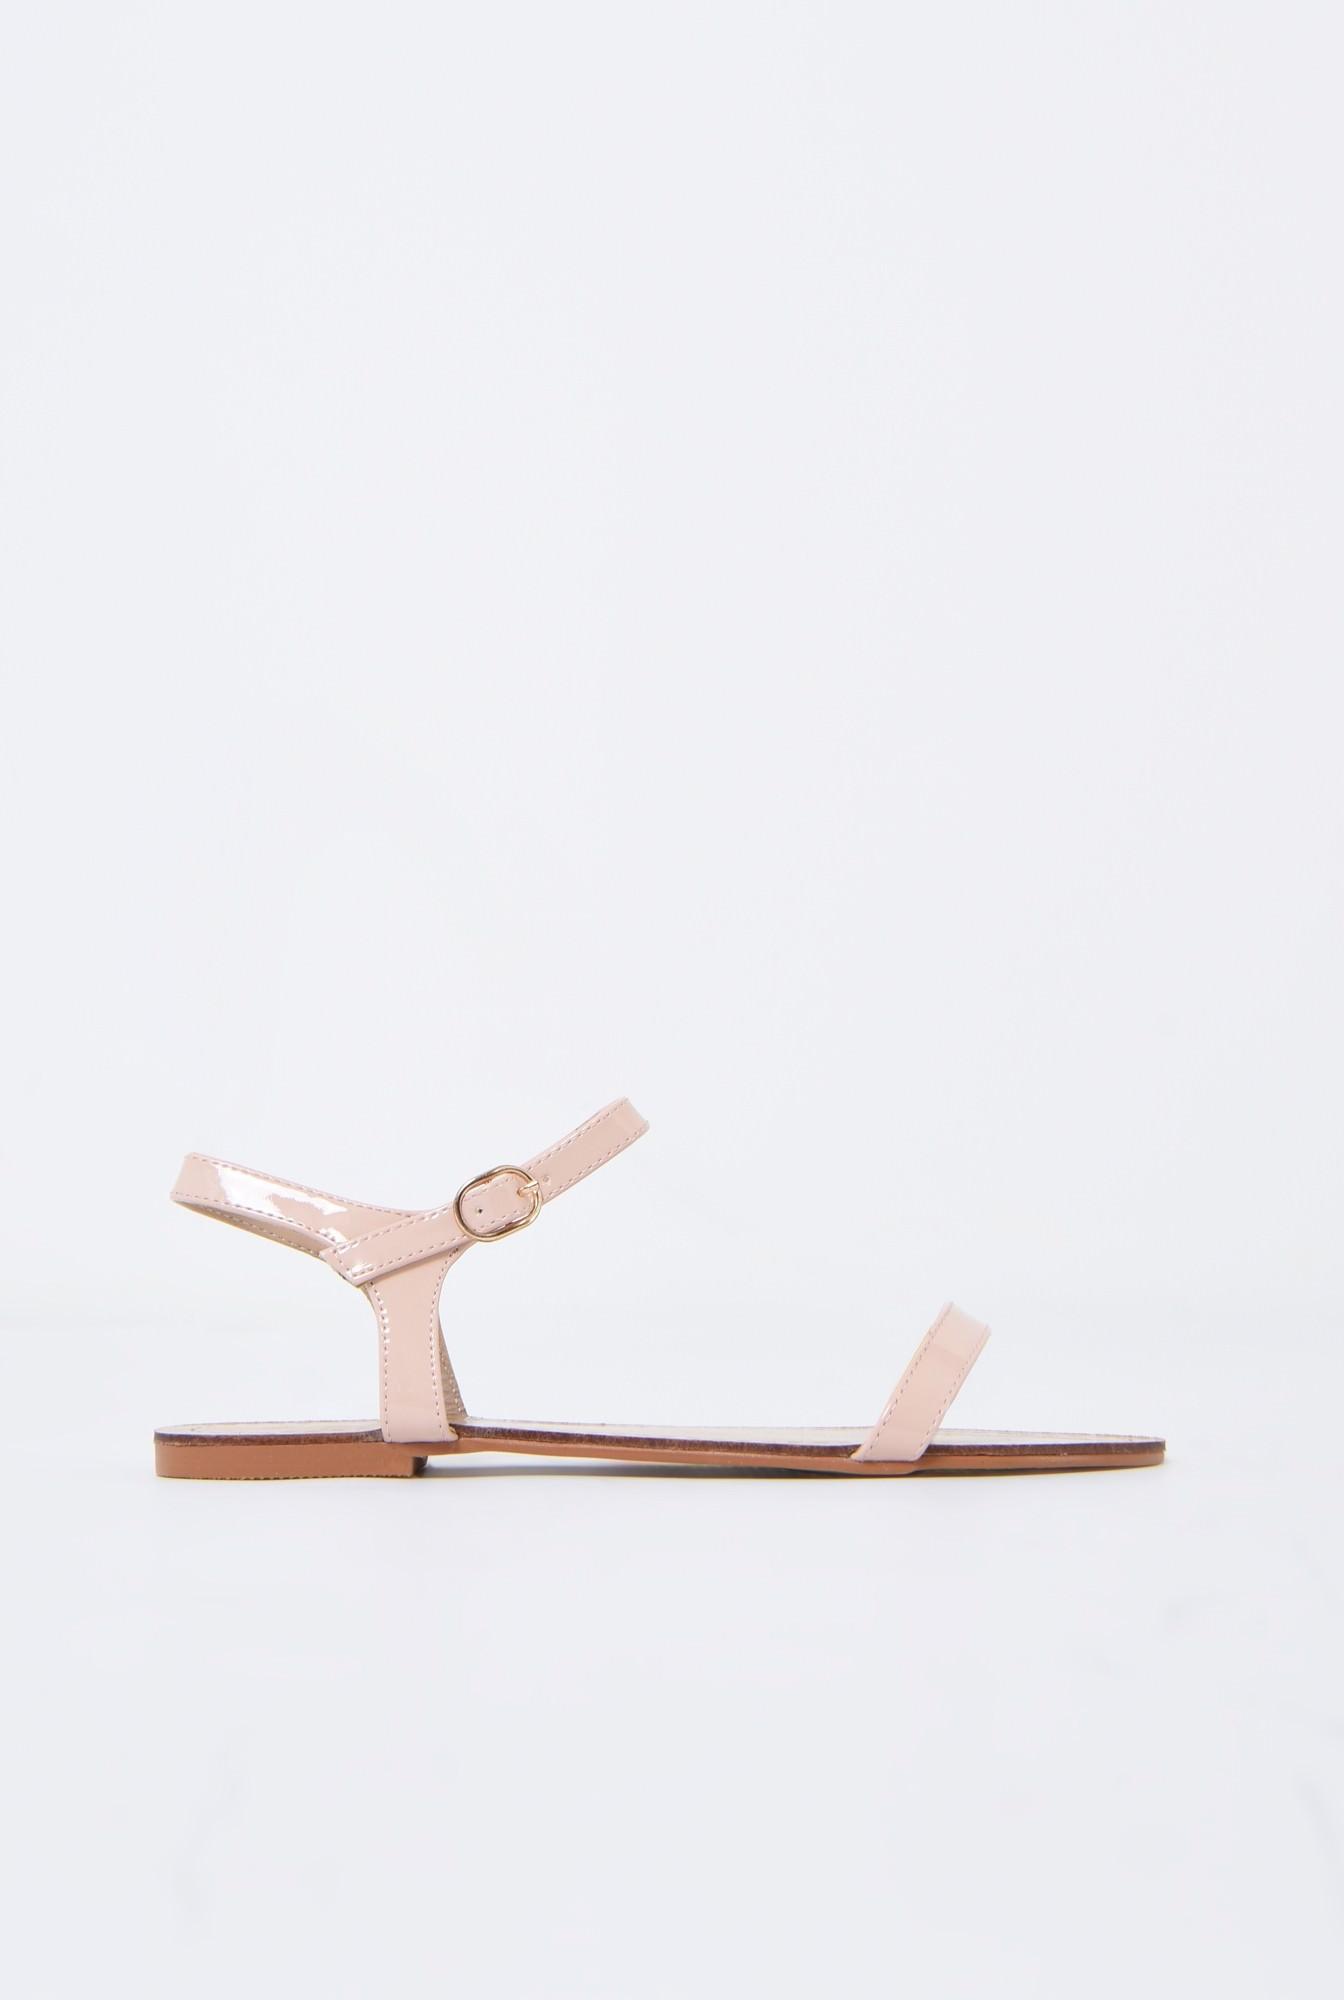 0 - sandale din lac, crem, minimaliste, talpa joasa